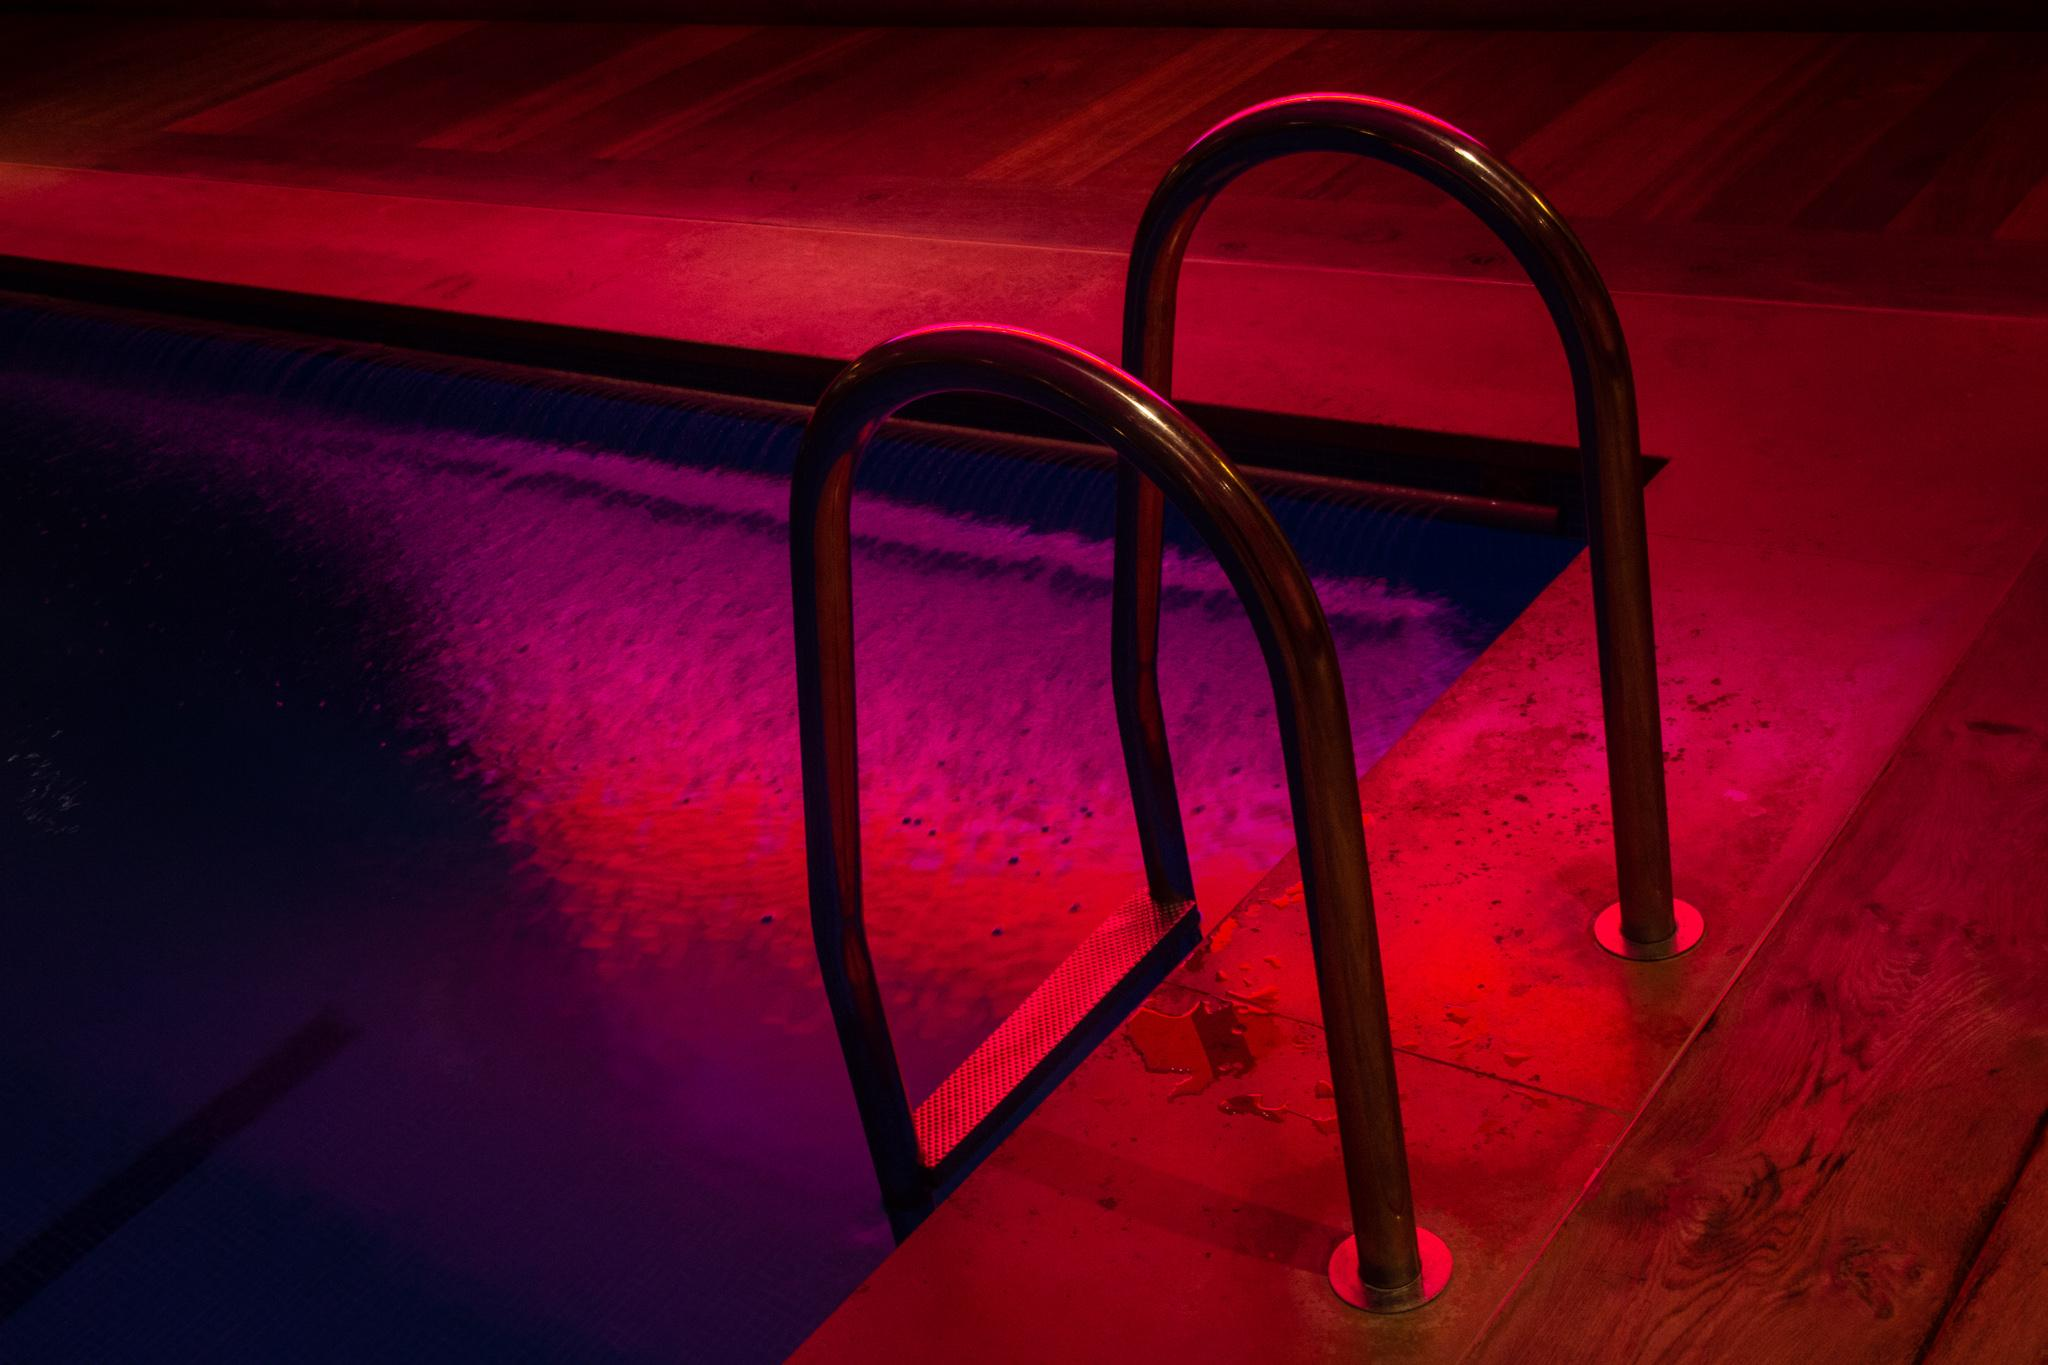 Magenta Swimming - Vibrant Noir Photography